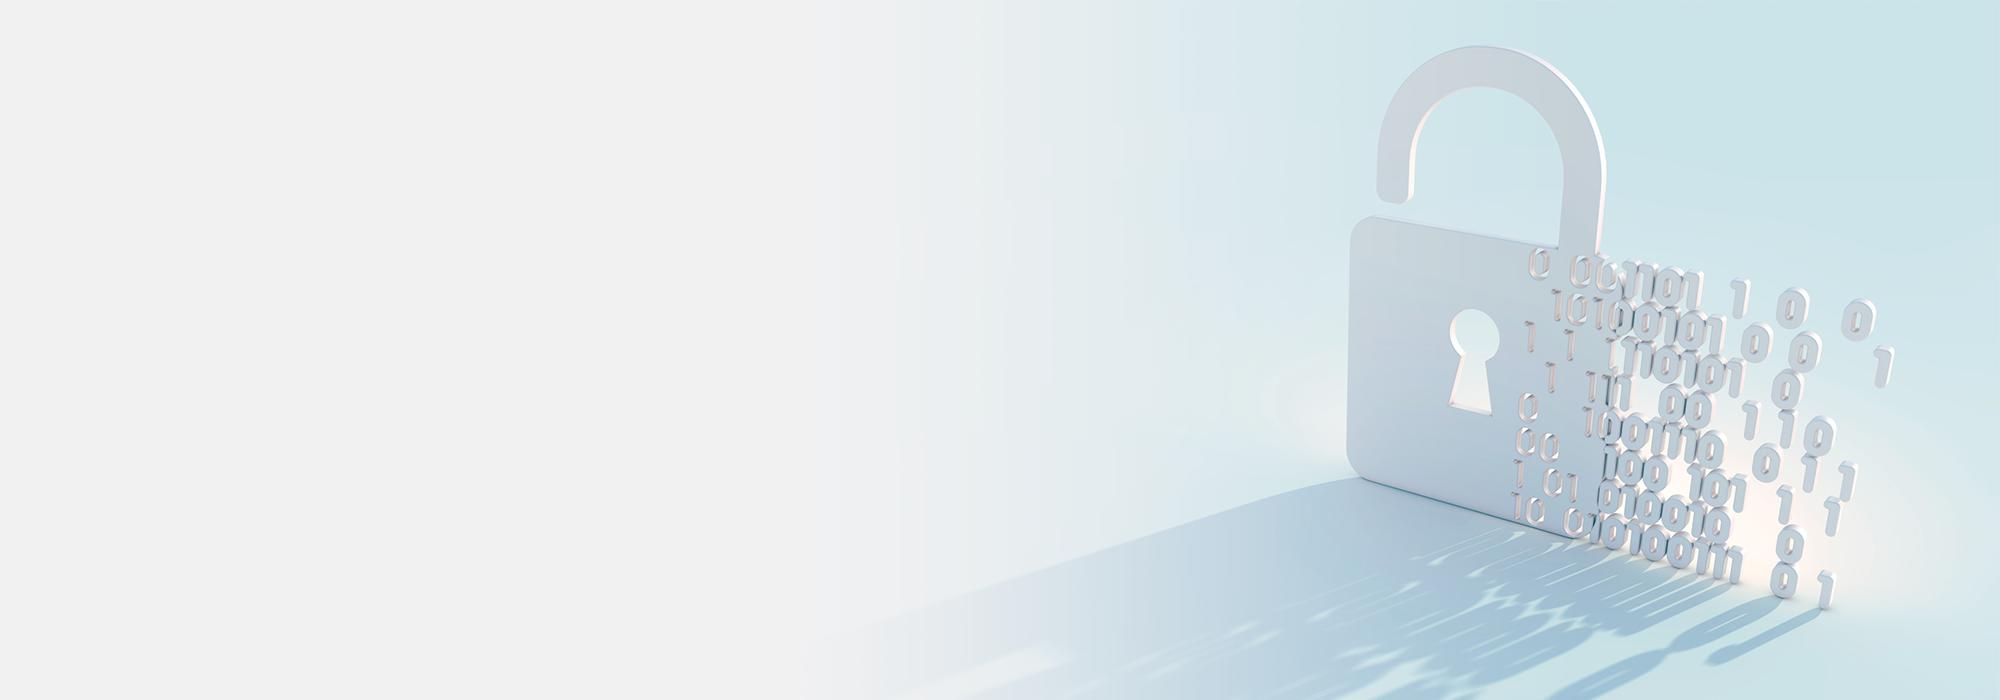 Privacy Policy | Tek Portal | 700x2000